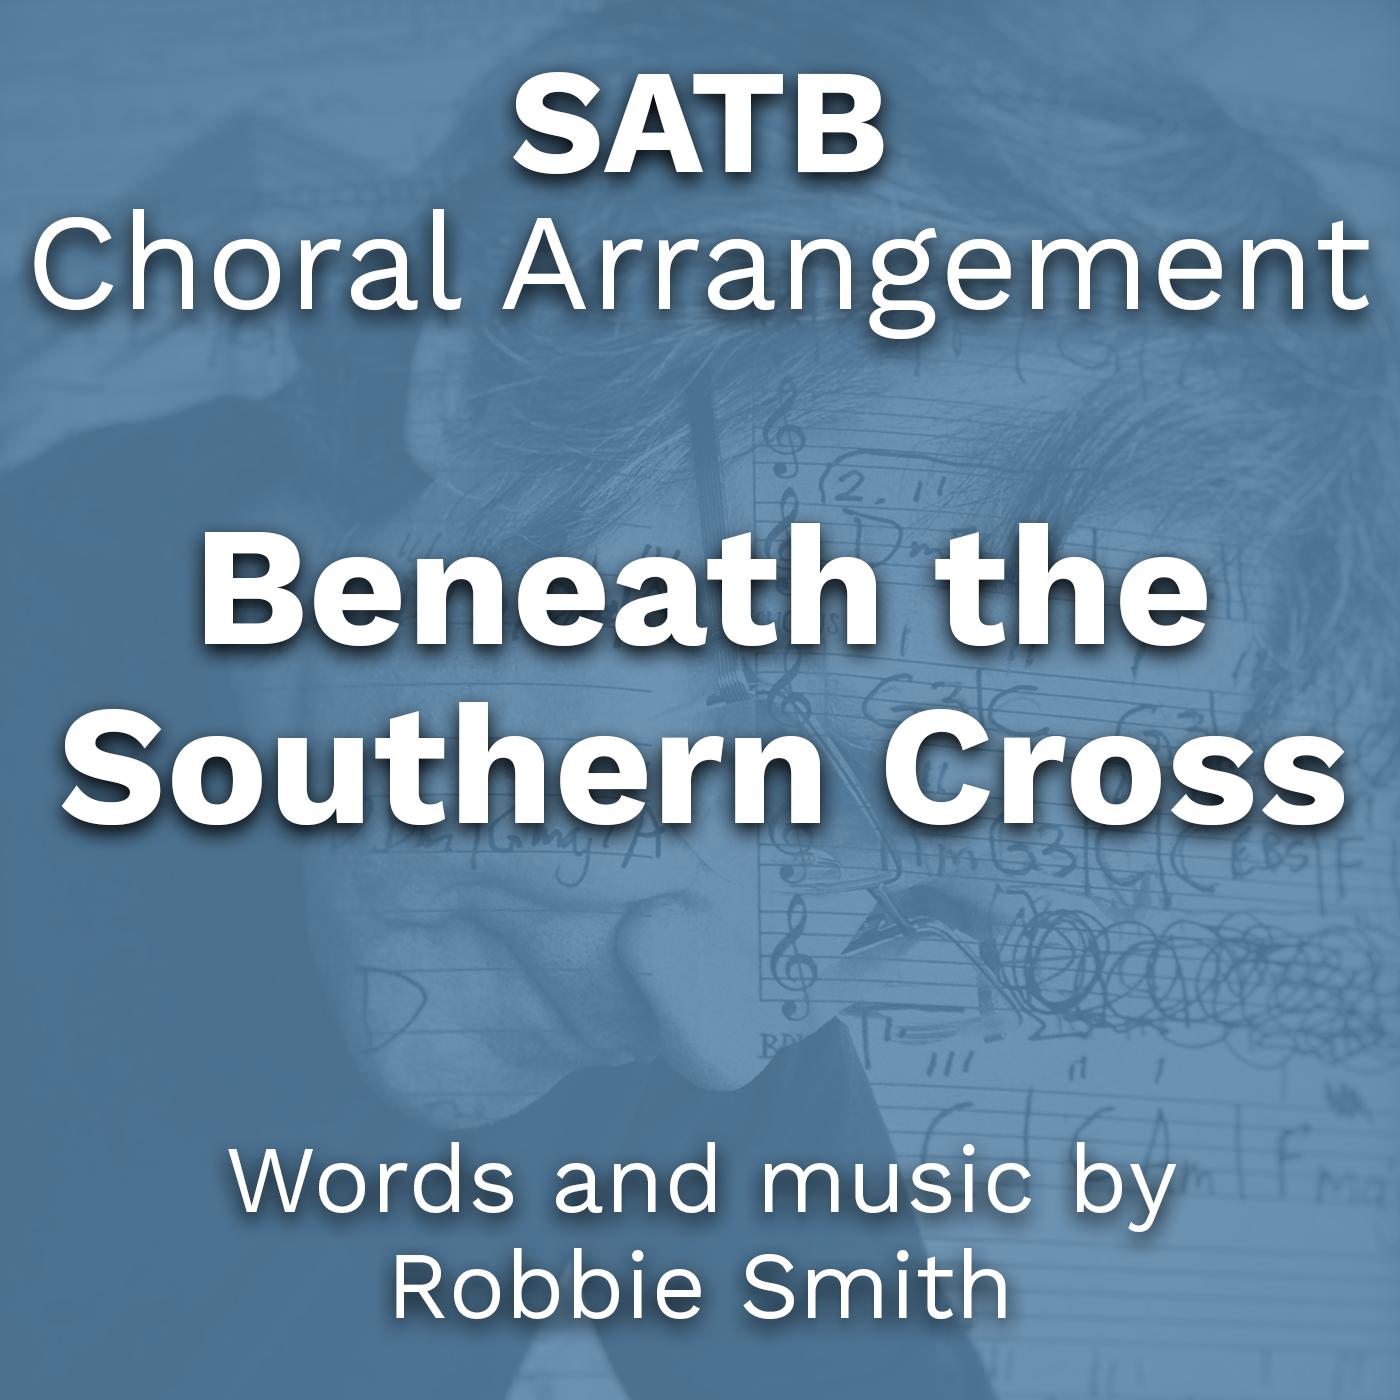 Choral-thumb-southerncross-satb